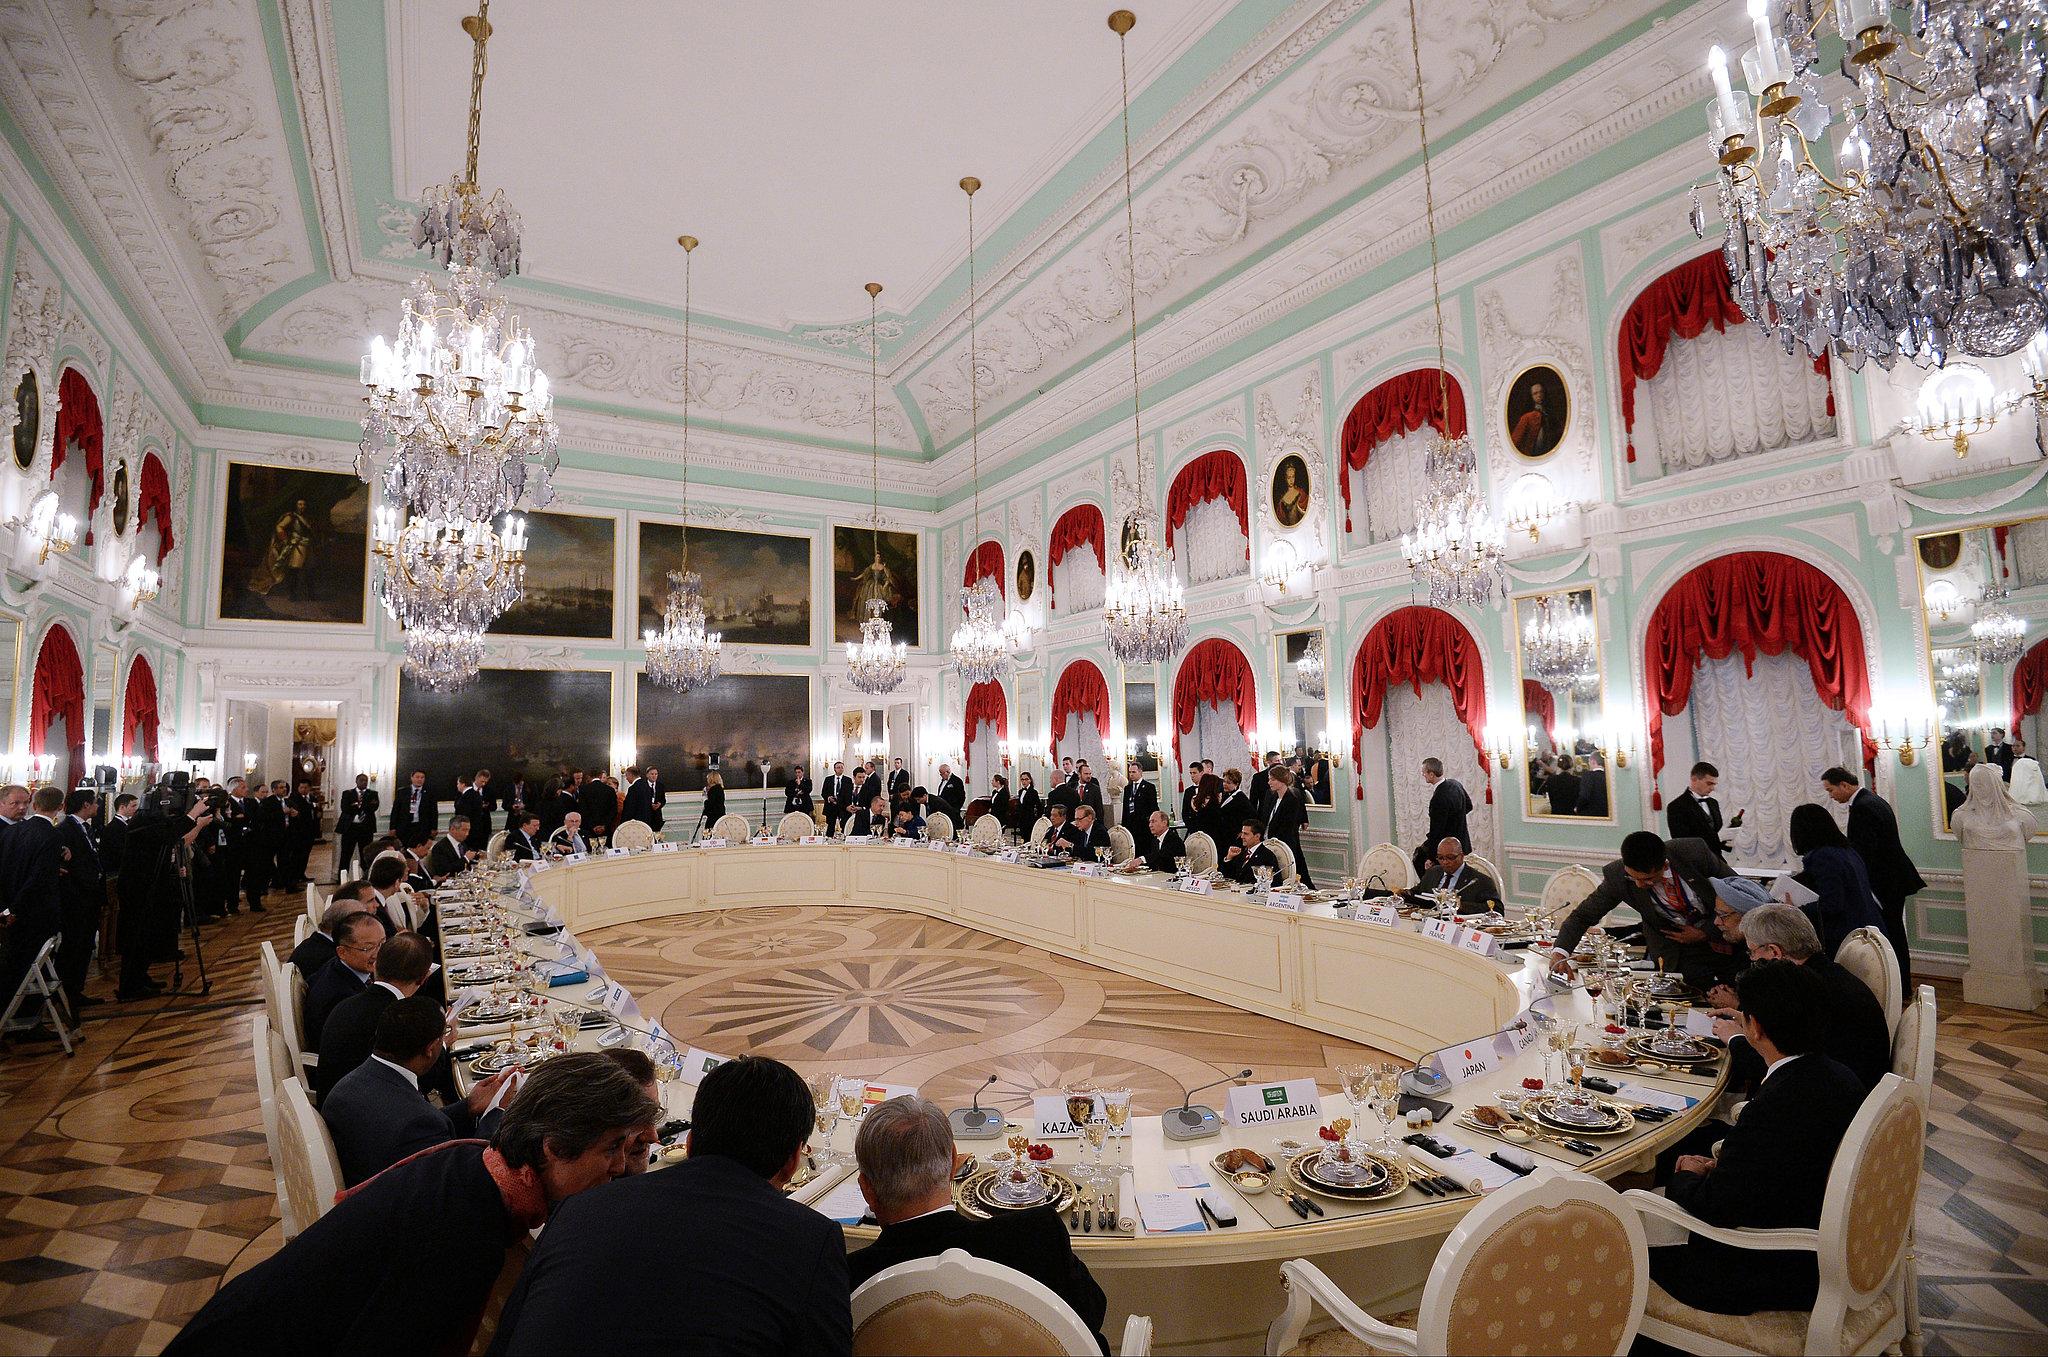 G20 Summit members got to work during their lavish dinner on Thursday.